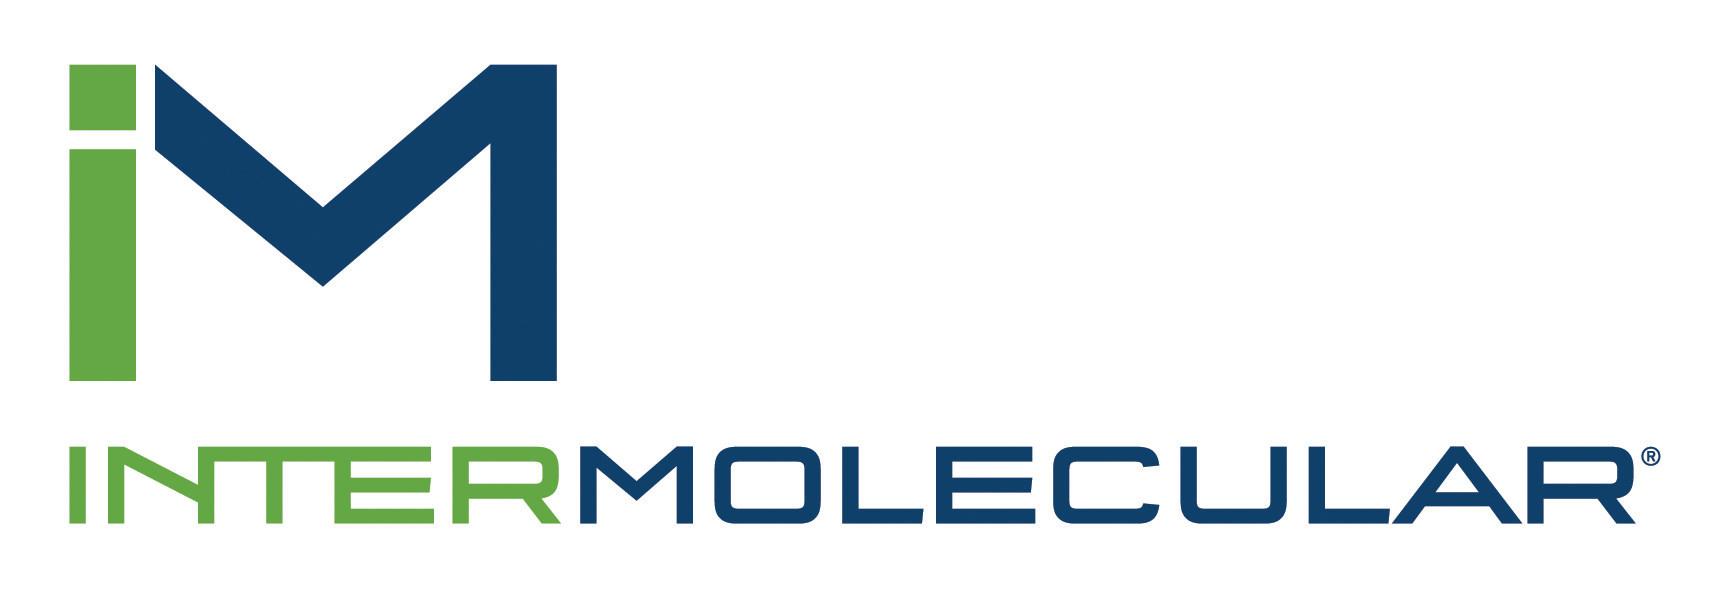 Intermolecular Logo (PRNewsfoto/Intermolecular, Inc.)